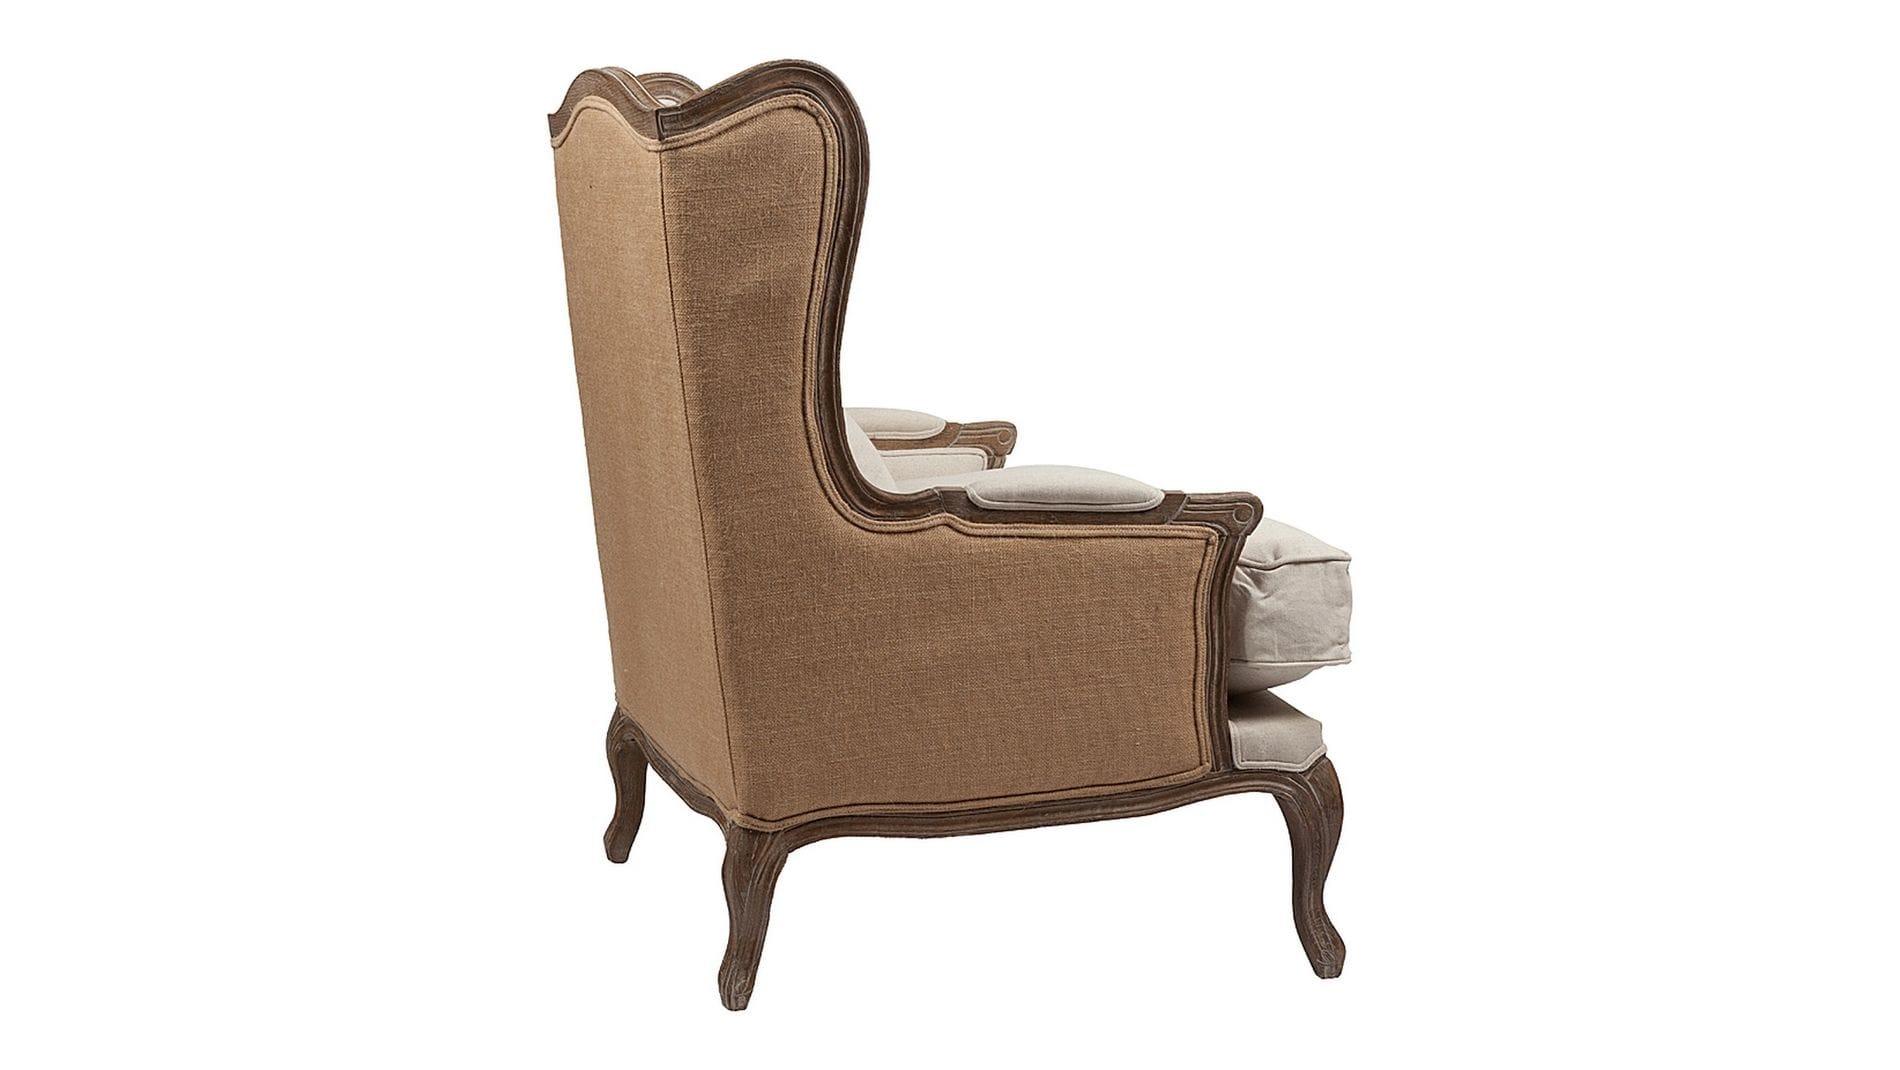 Кресло Lorraine Chair with Burlap Бежевое Лен